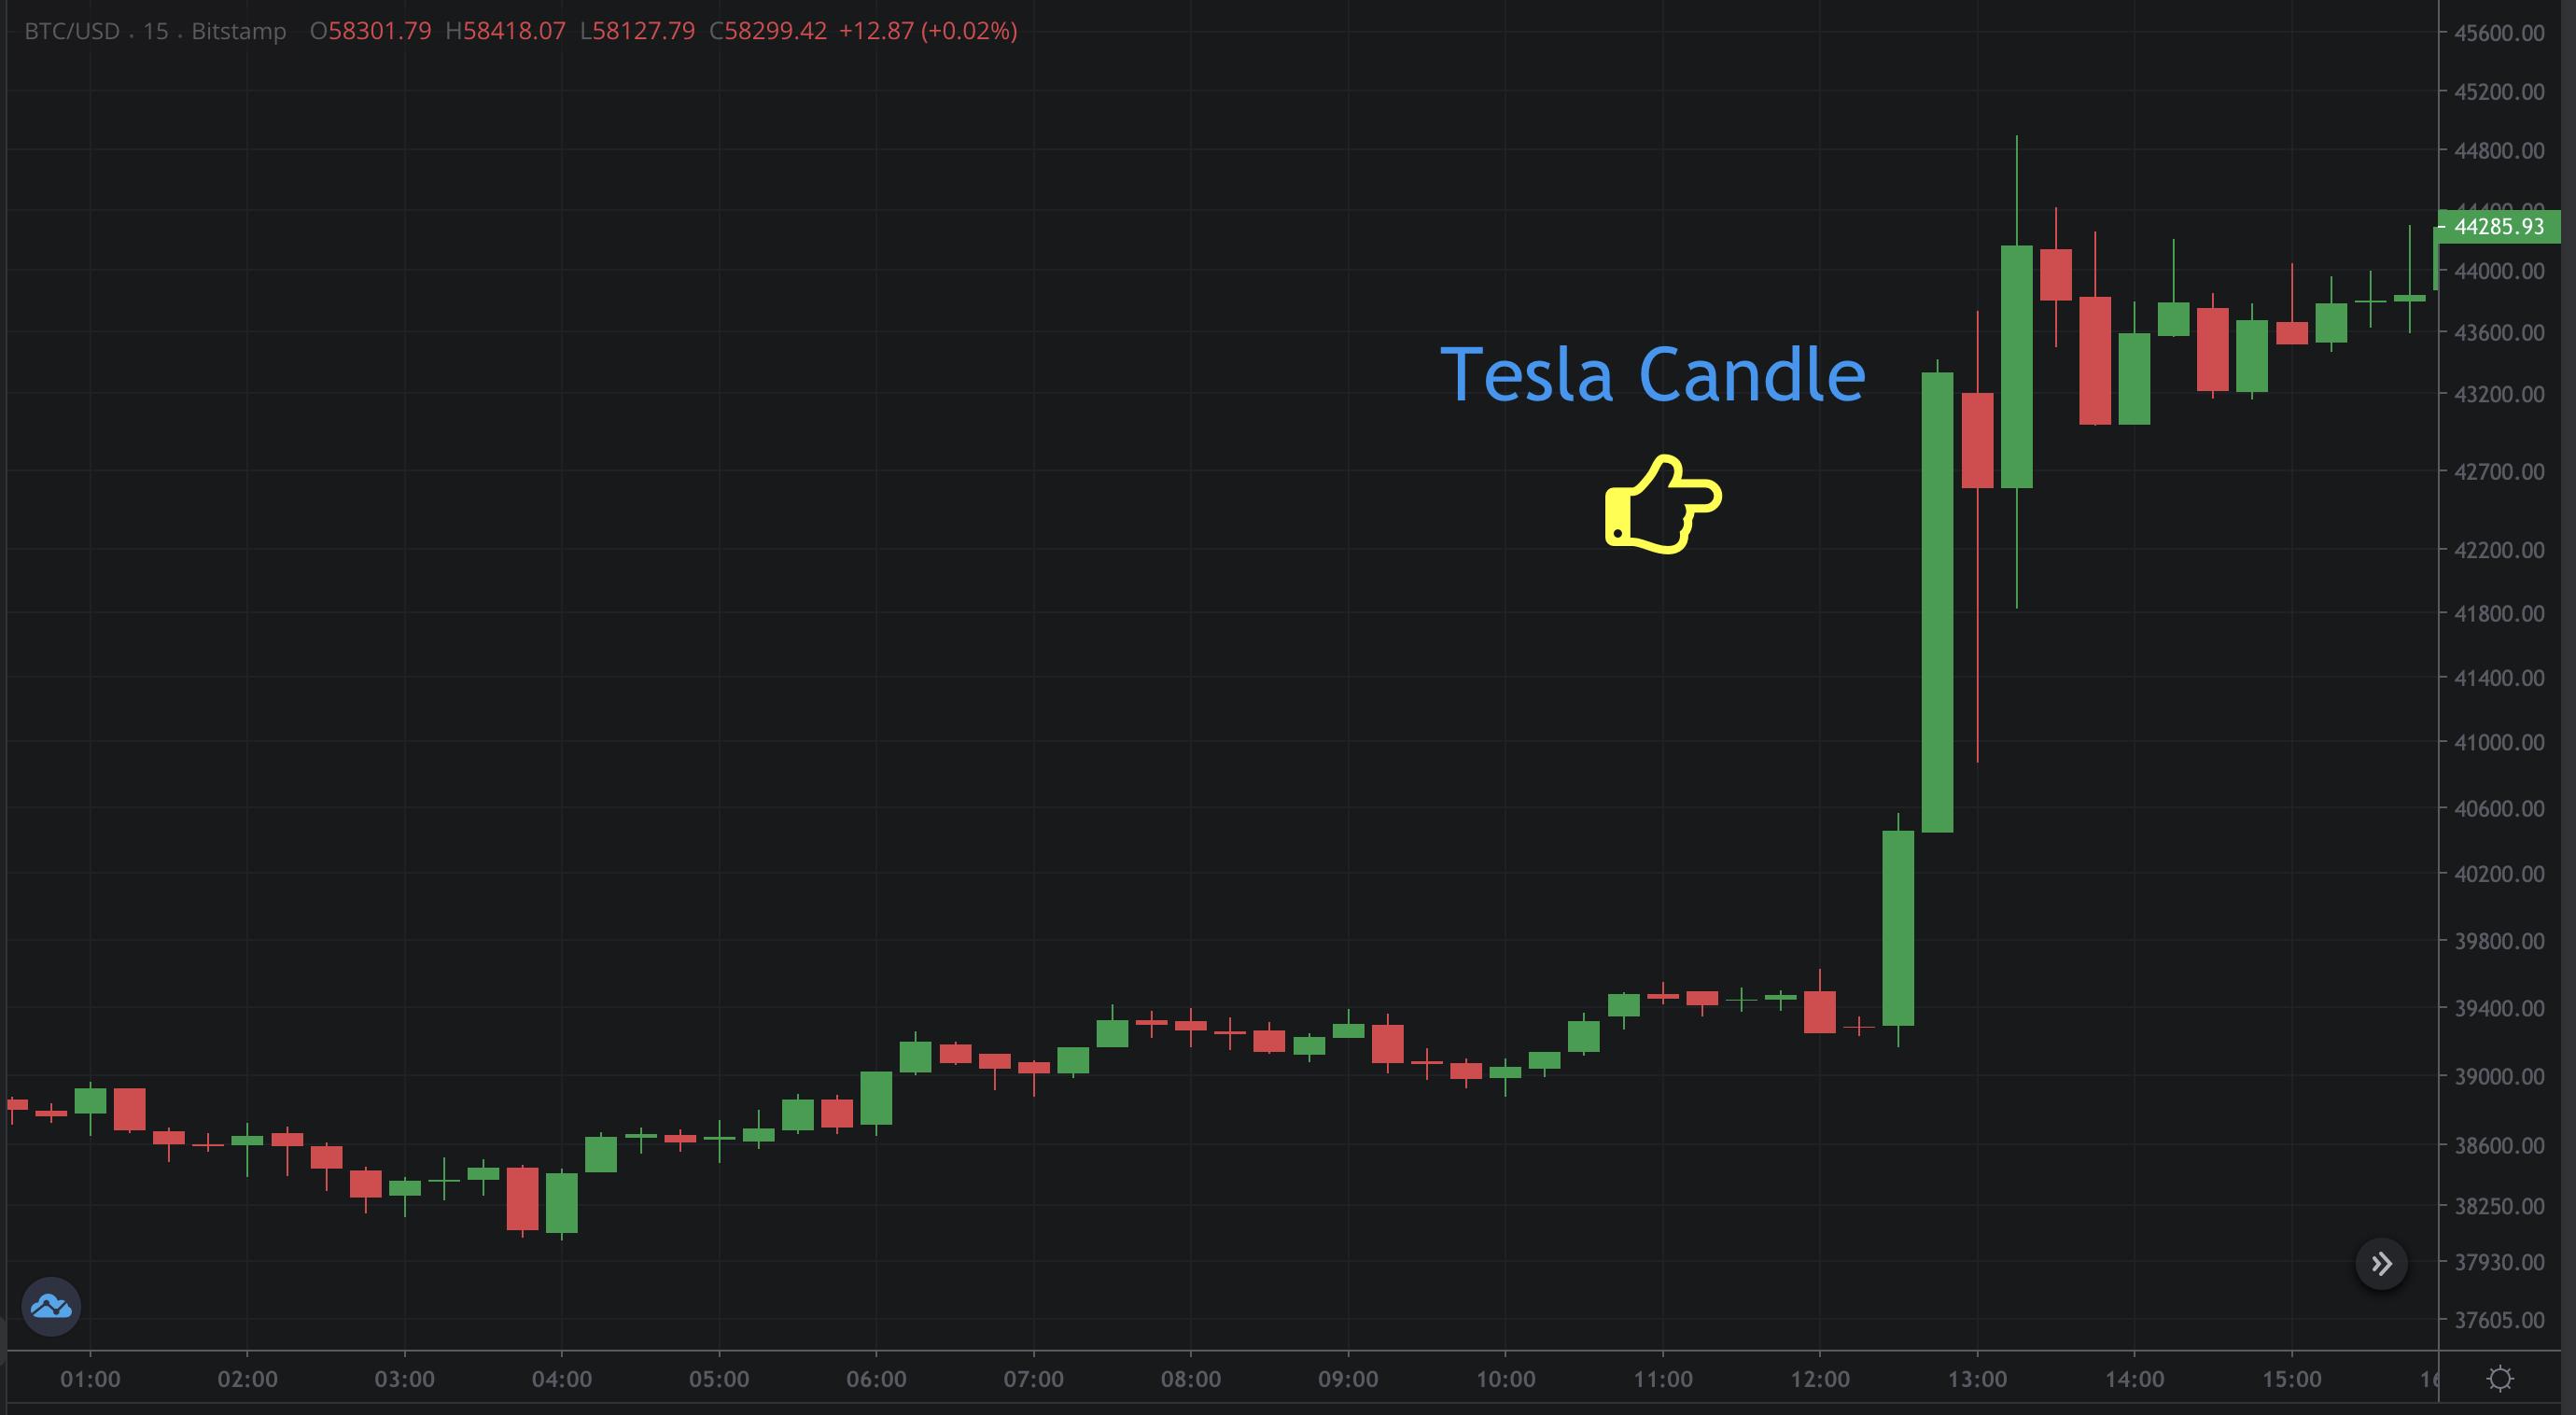 Bitcoin Price Reacts to Tesla News